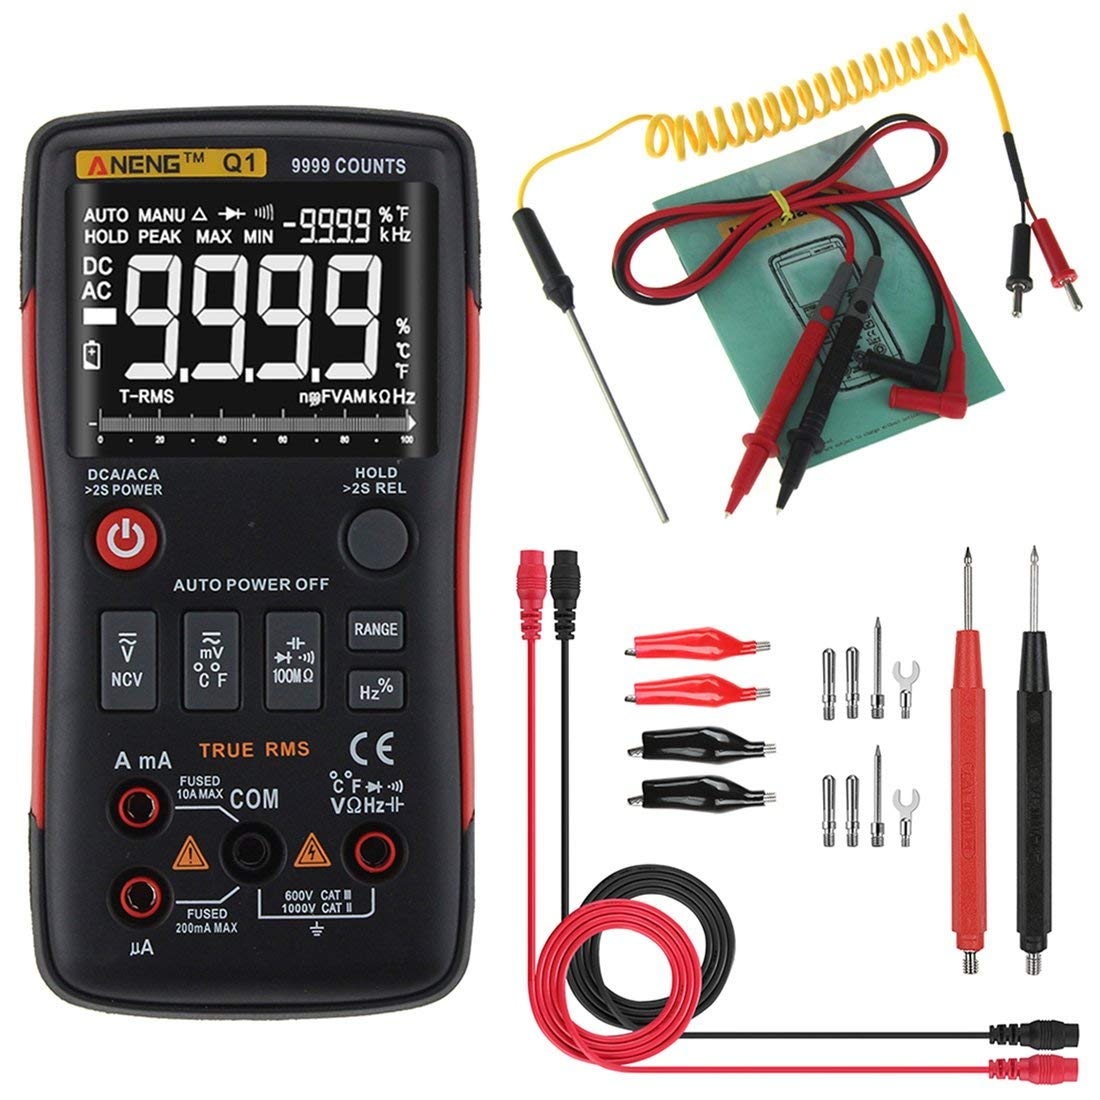 Multimetro digitale ANENG Q1 9999 Conteggi True RMS Auto/Manuale Gamma AC/DC Volt Amp Ohm Capacità Frequenza Temperatura Tester Formulaone